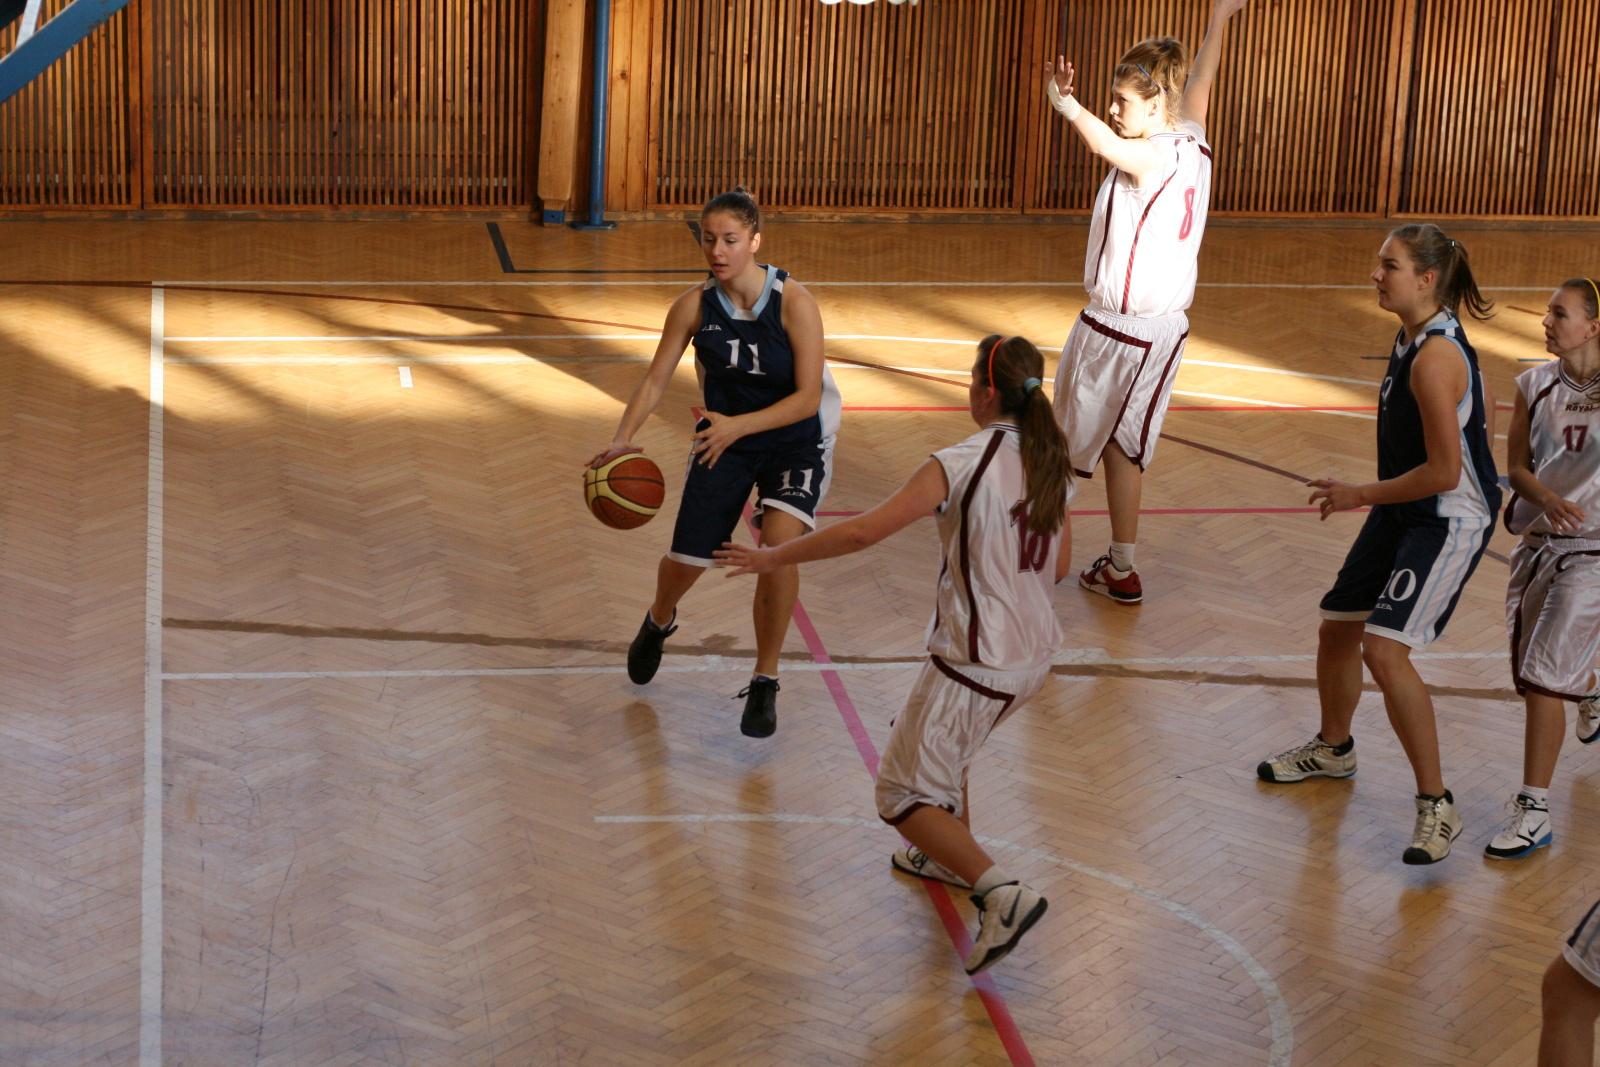 bk-zs-zvolen-bk-petrzalka-basketbal-juniorky-5